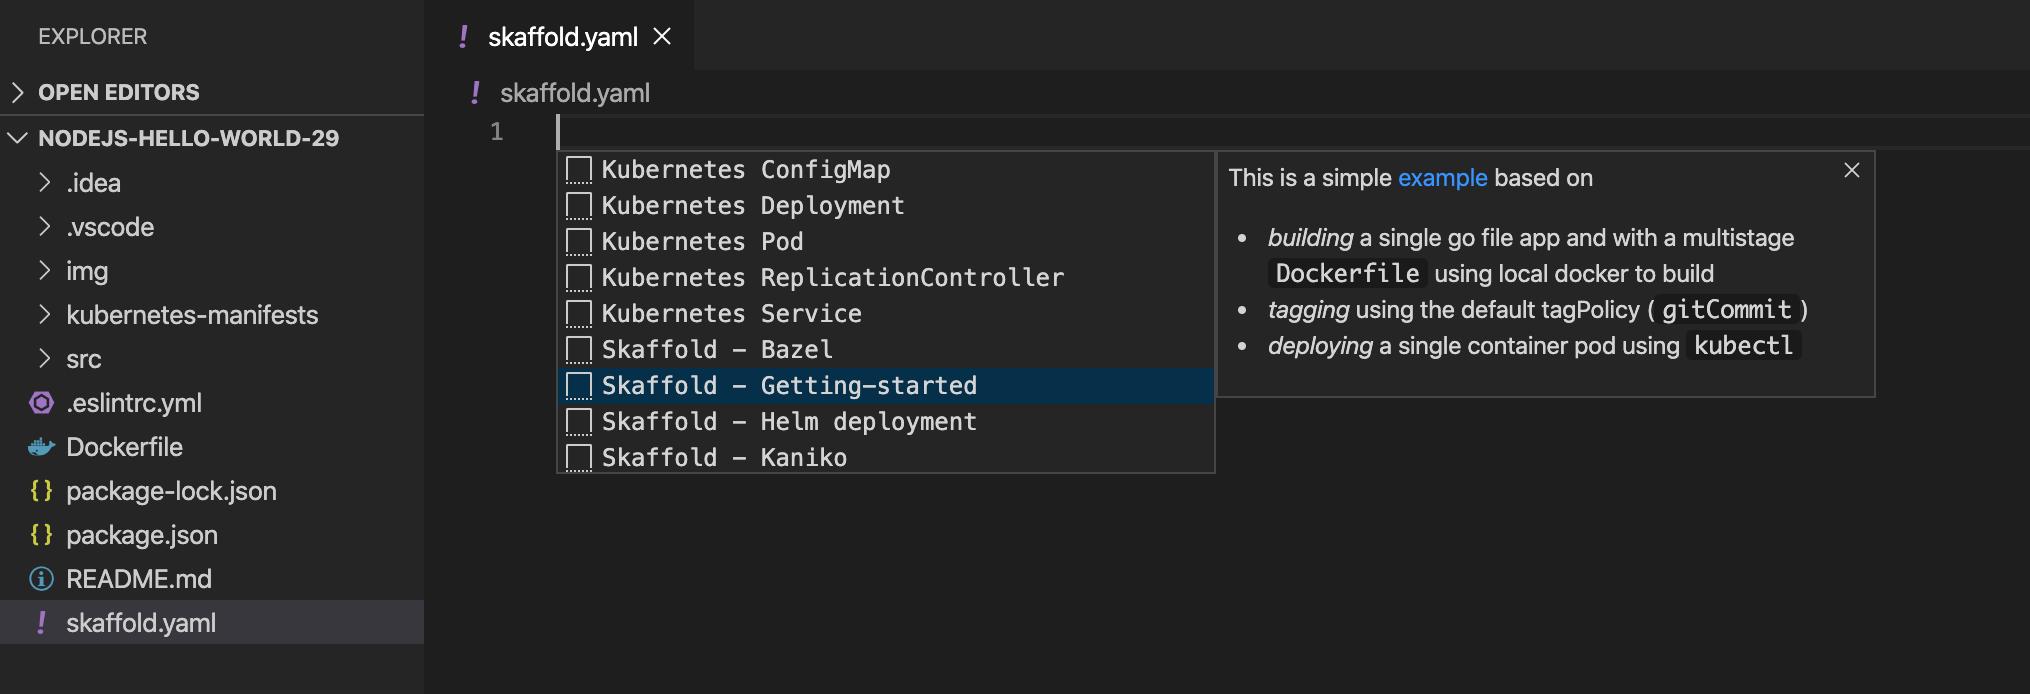 Skaffold-Konfiguration manuell erstellen (Intellisense)